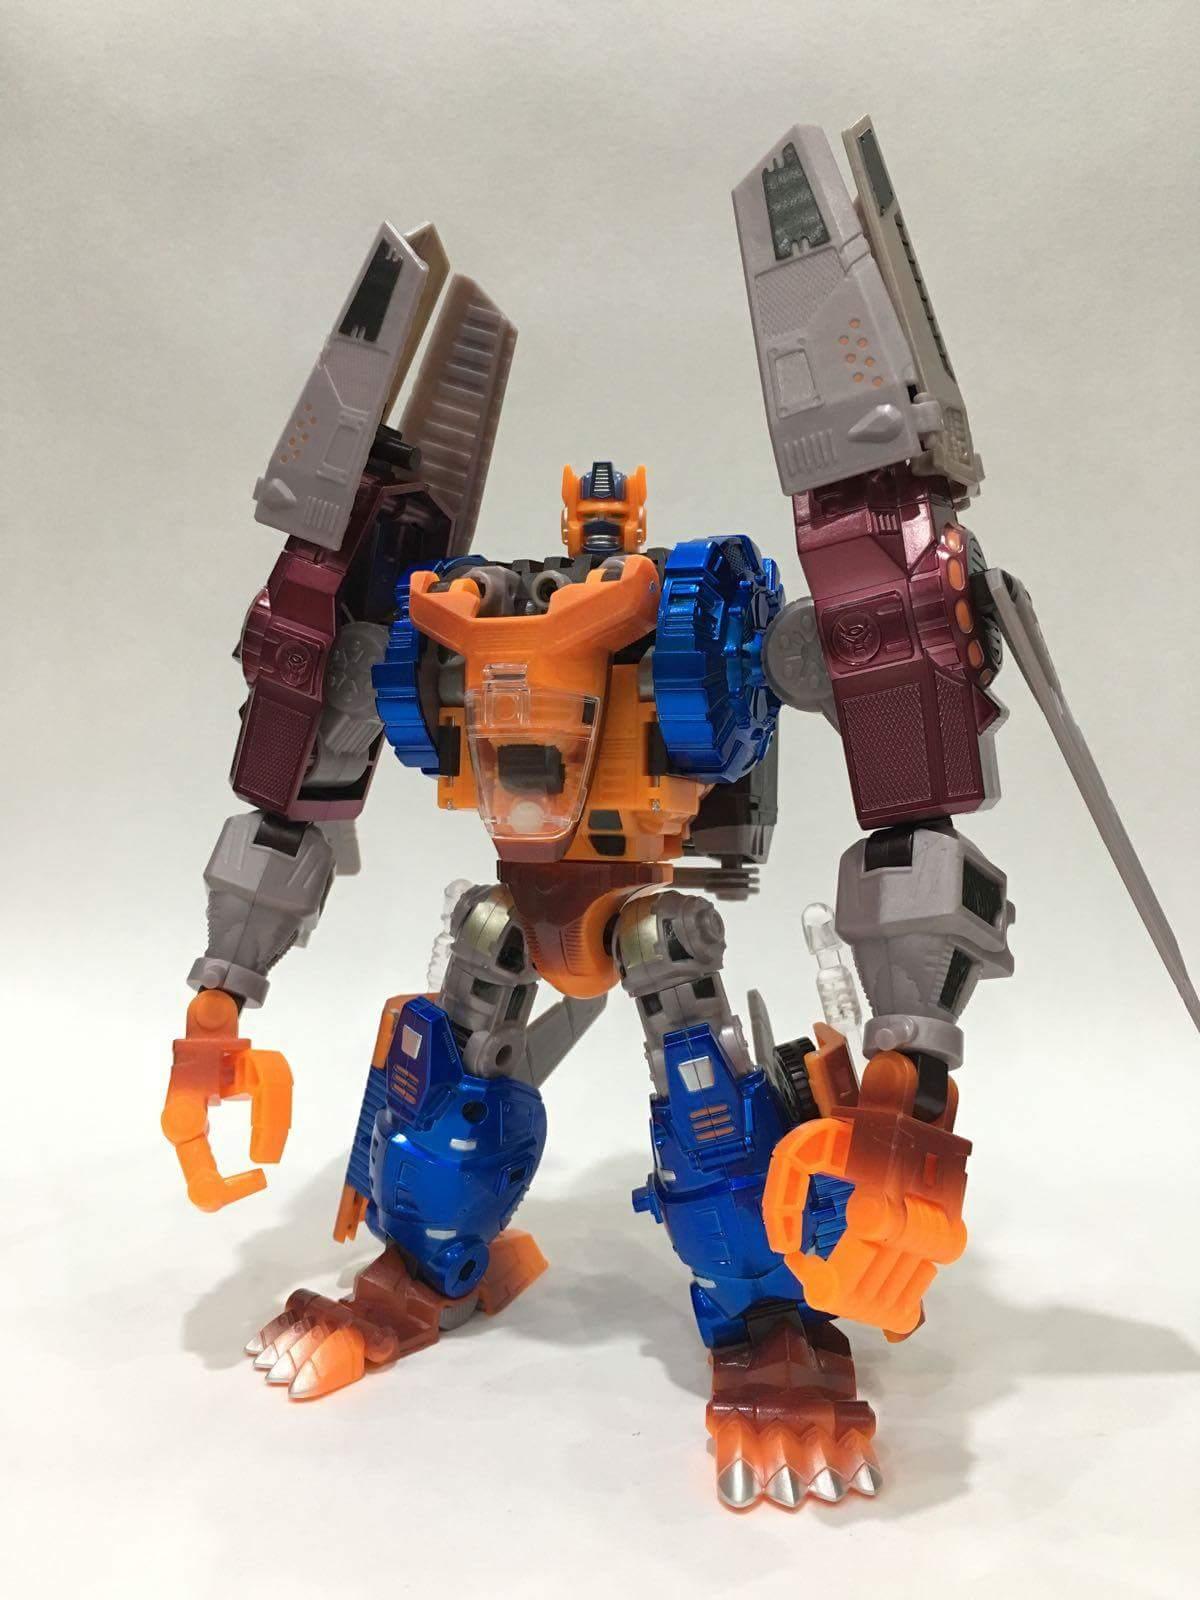 [TransArt Toys] Produit Tiers - Gamme R - Basé sur Beast Wars SbkZ7hQV